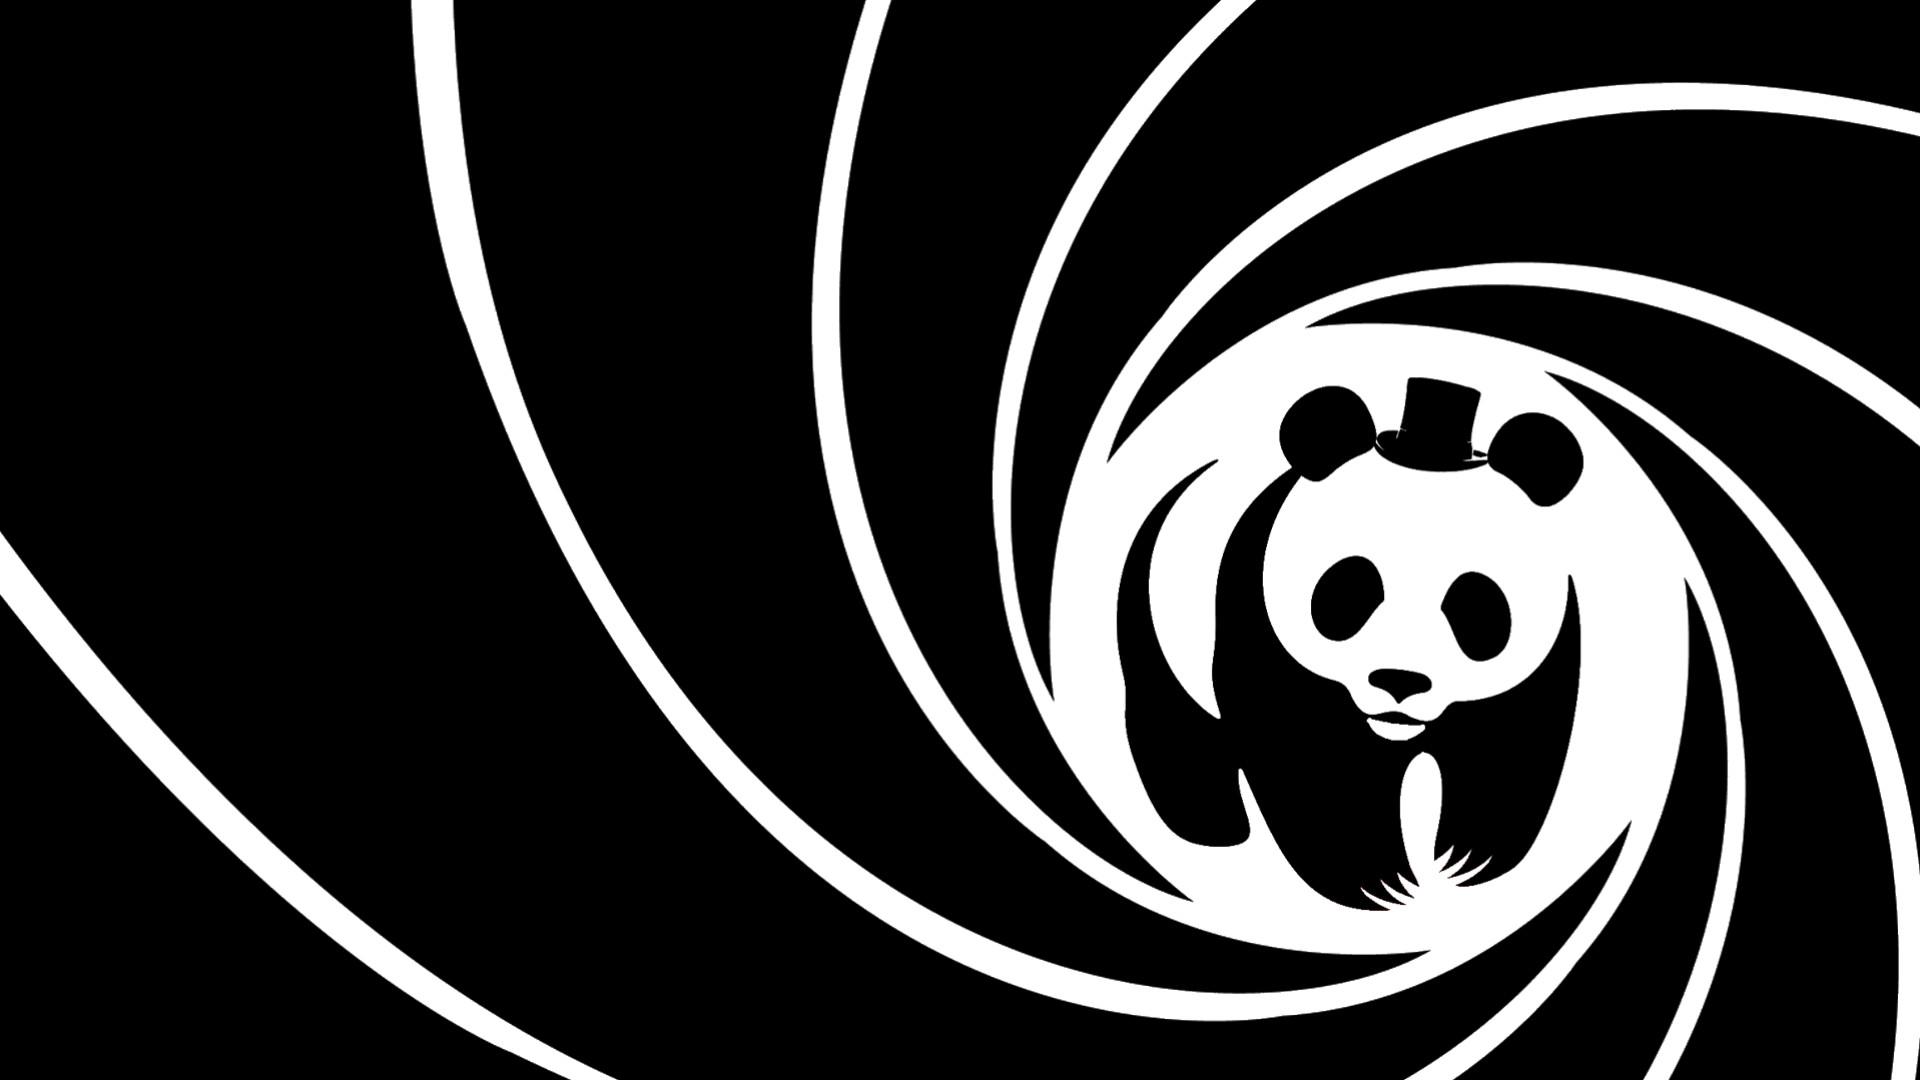 Top anime panda wallpaper images wallpapers – Panda Wallpapers Hd Download  Free. Download